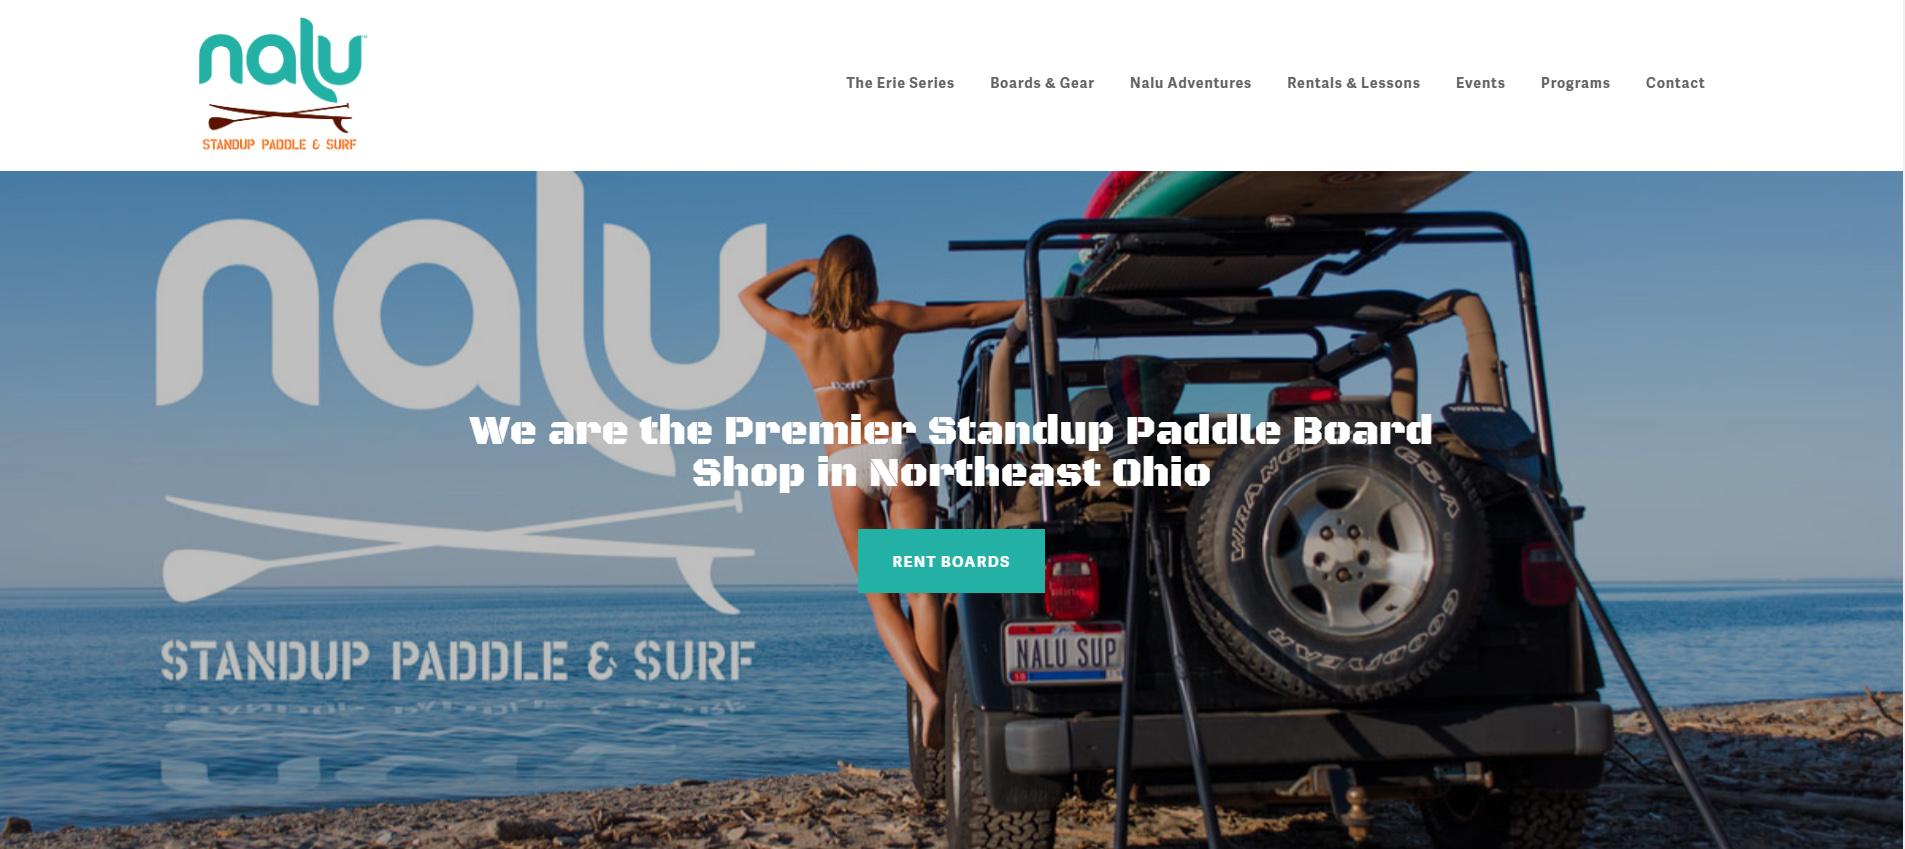 NALU STANDUP PADDLE & SURF